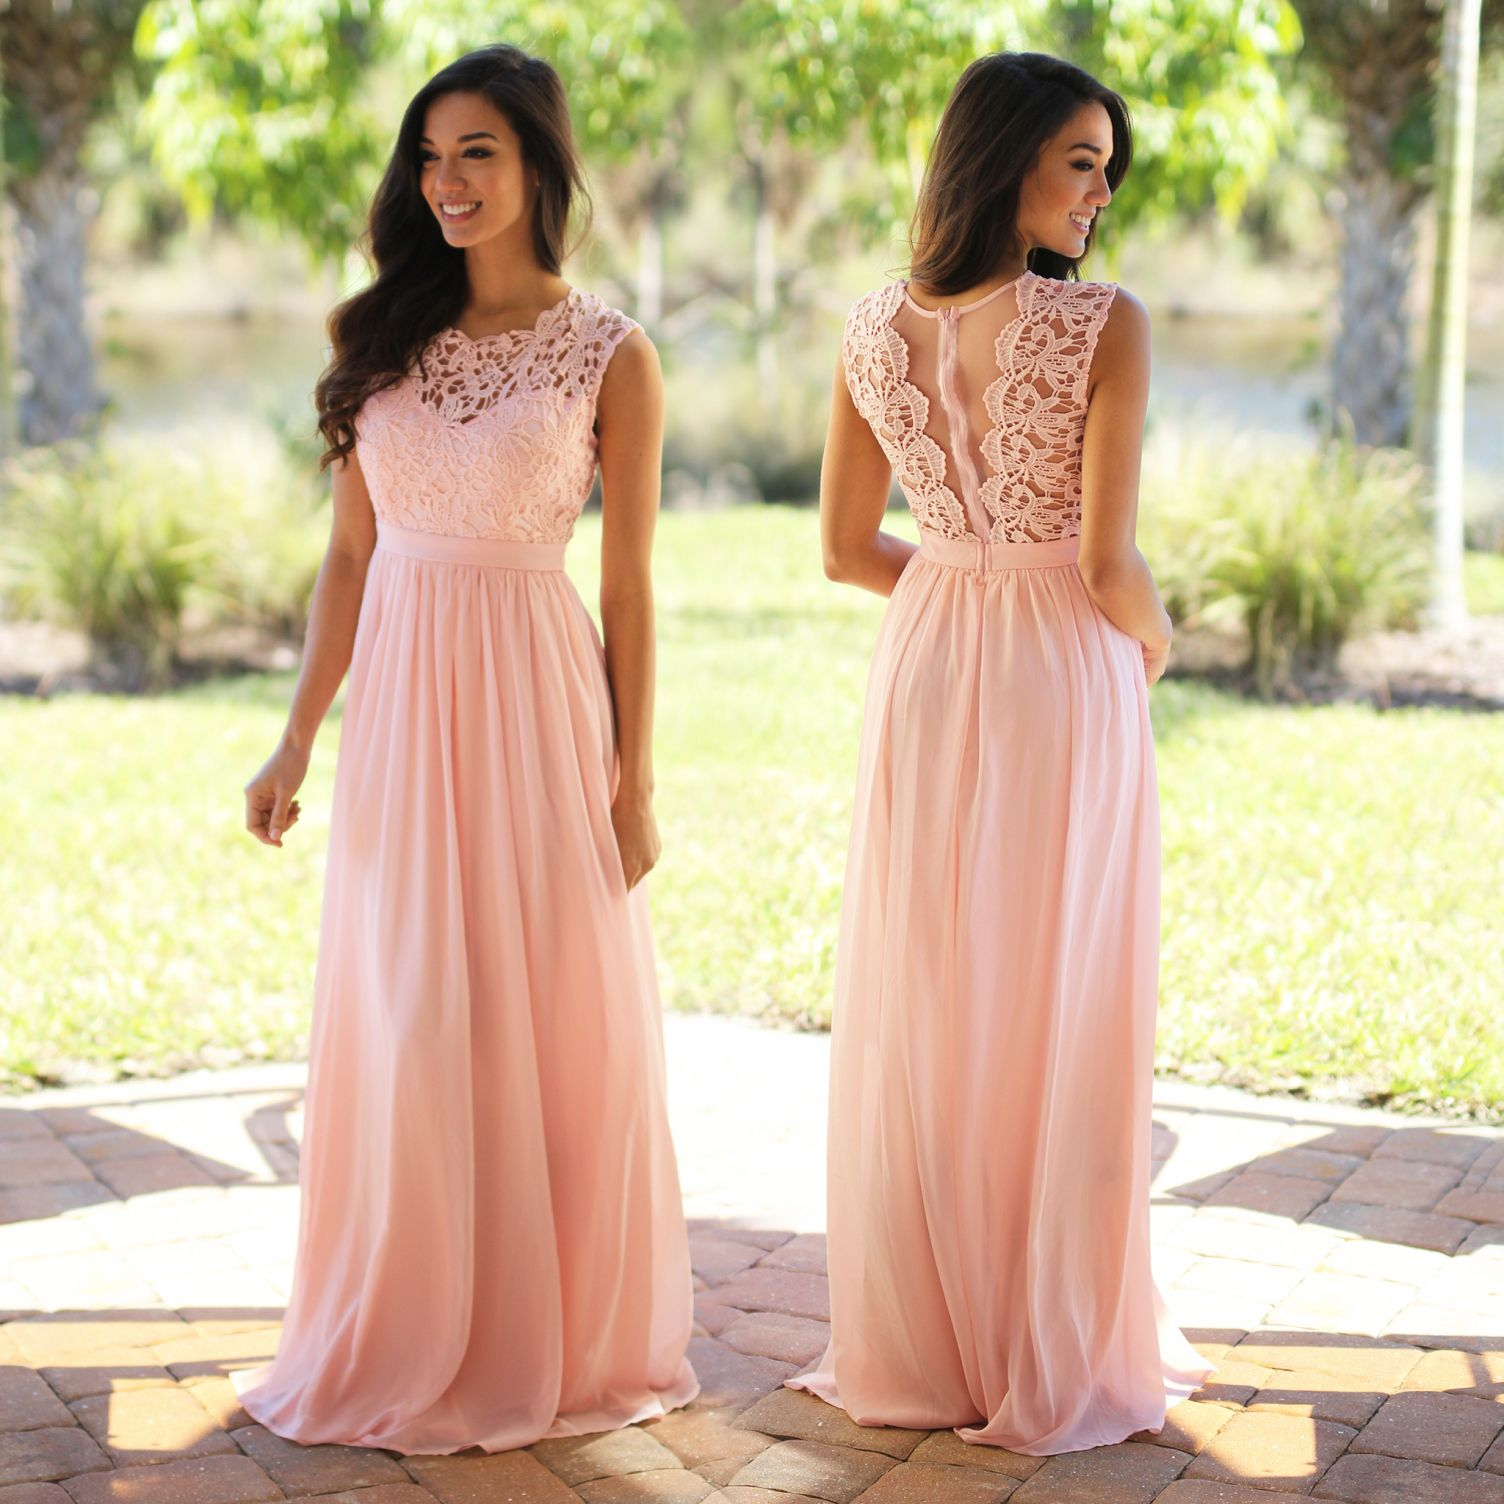 Elegant maxi dresses for weddings  Pin by Annora on Popular Wedding Dress  Pinterest  Maxi dresses